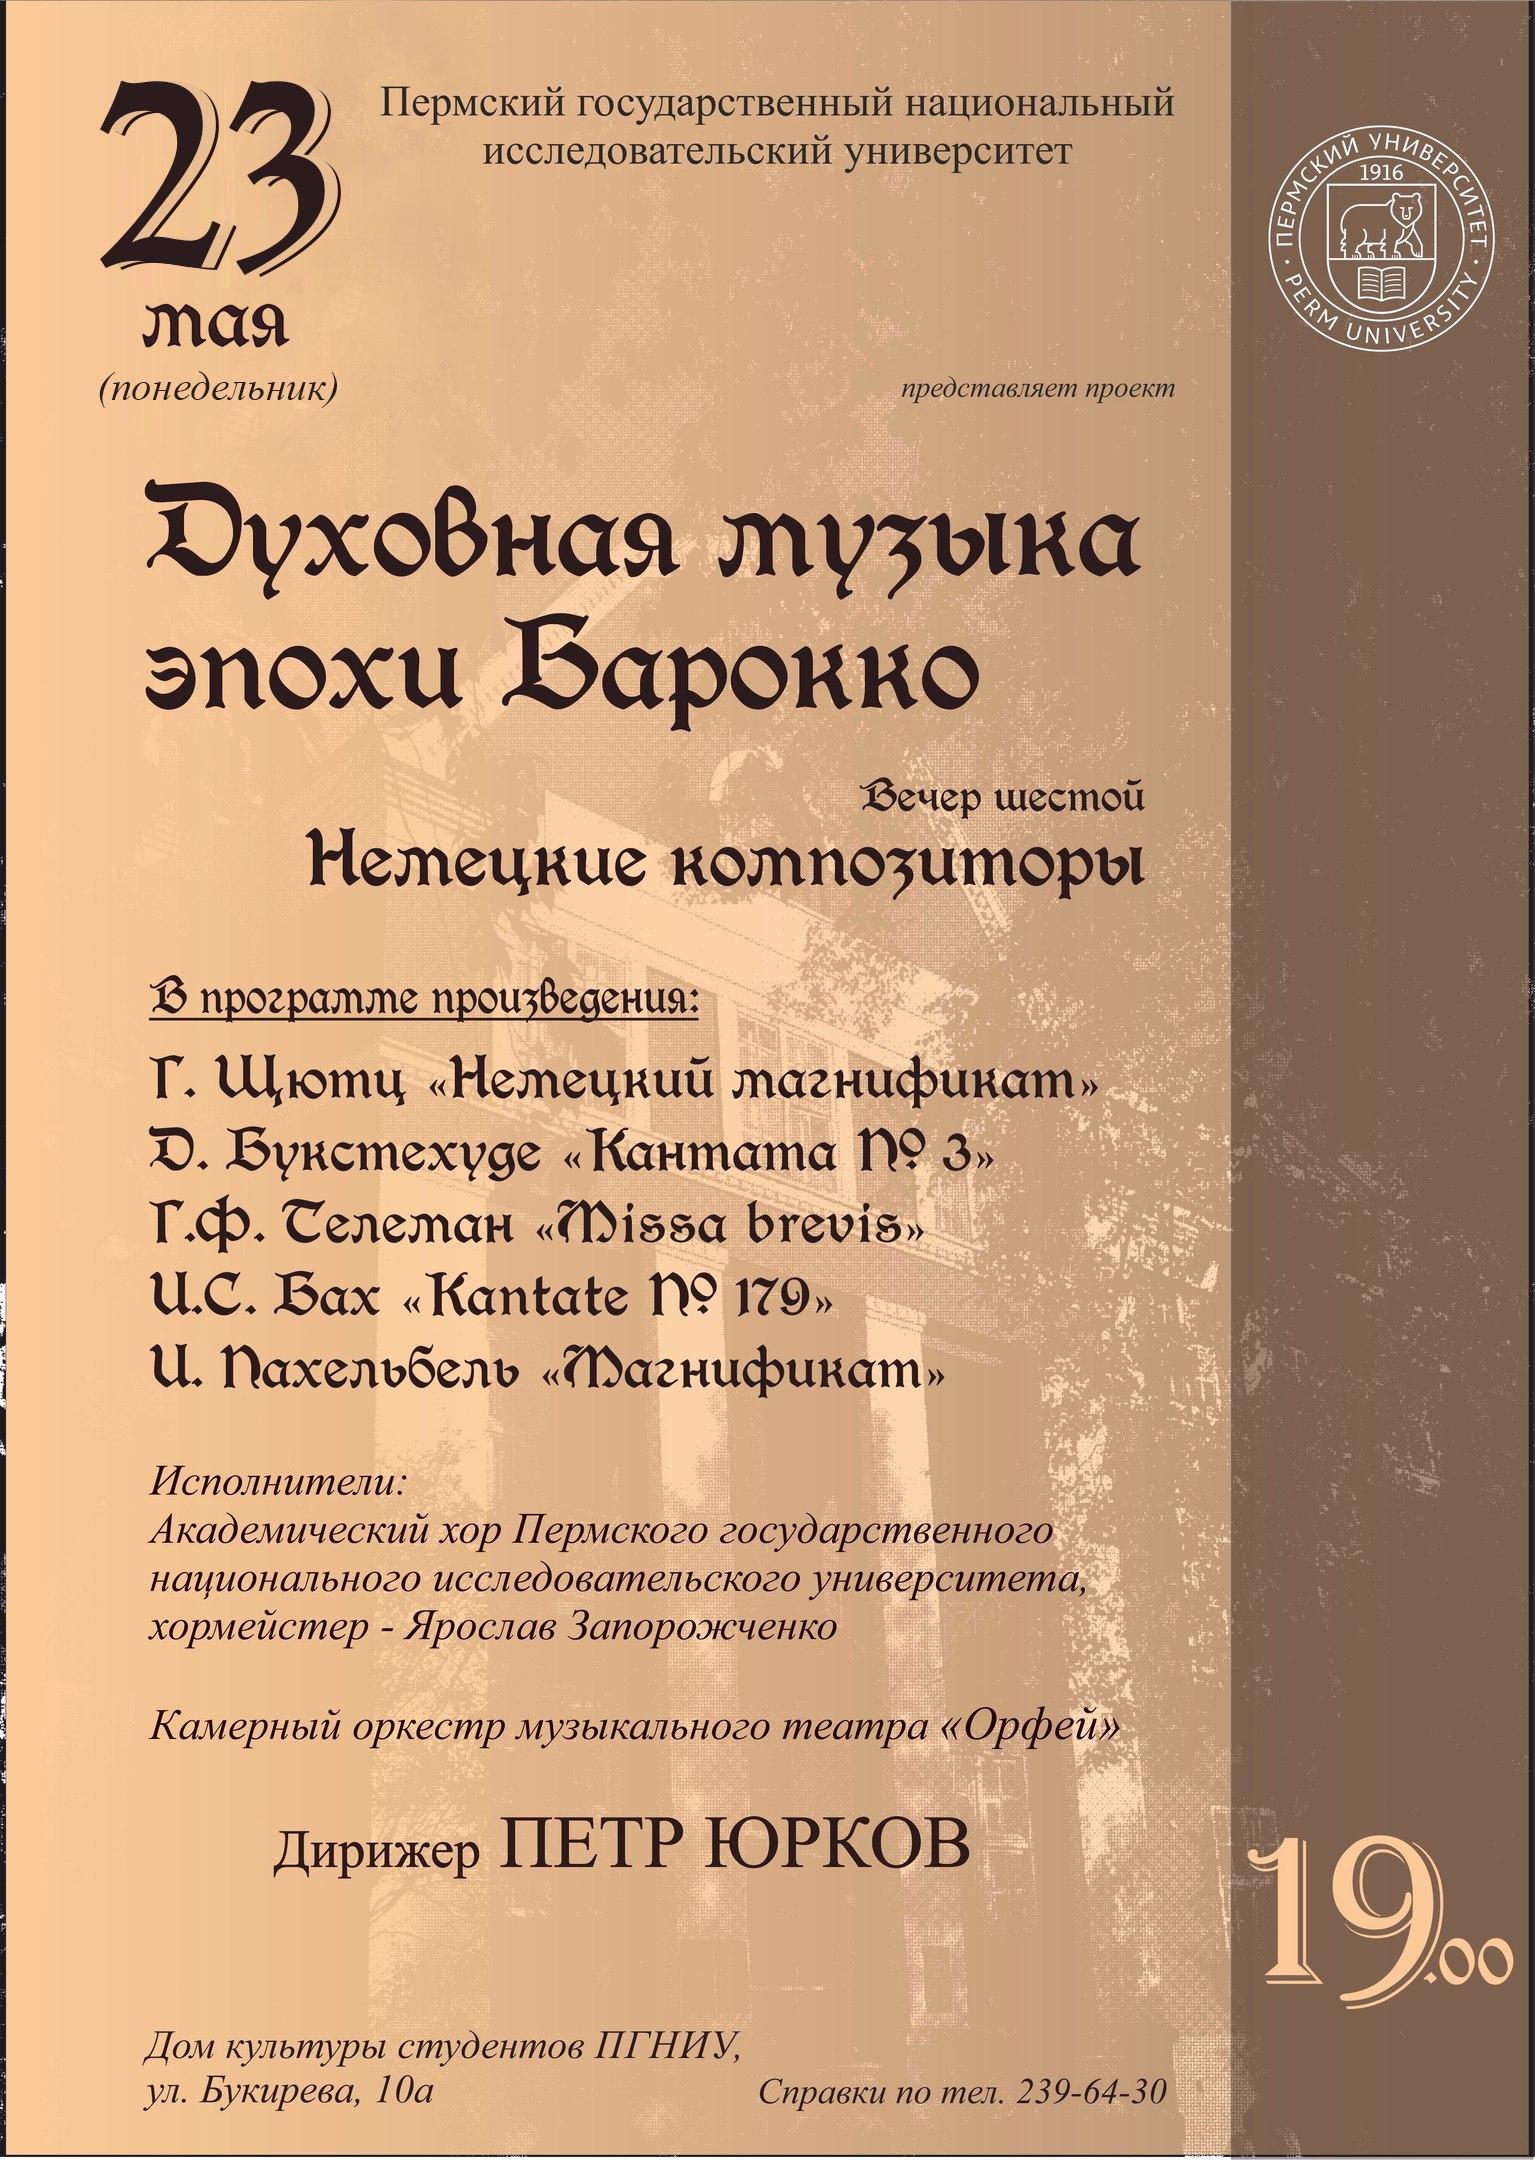 Духовная музыка эпохи Барокко